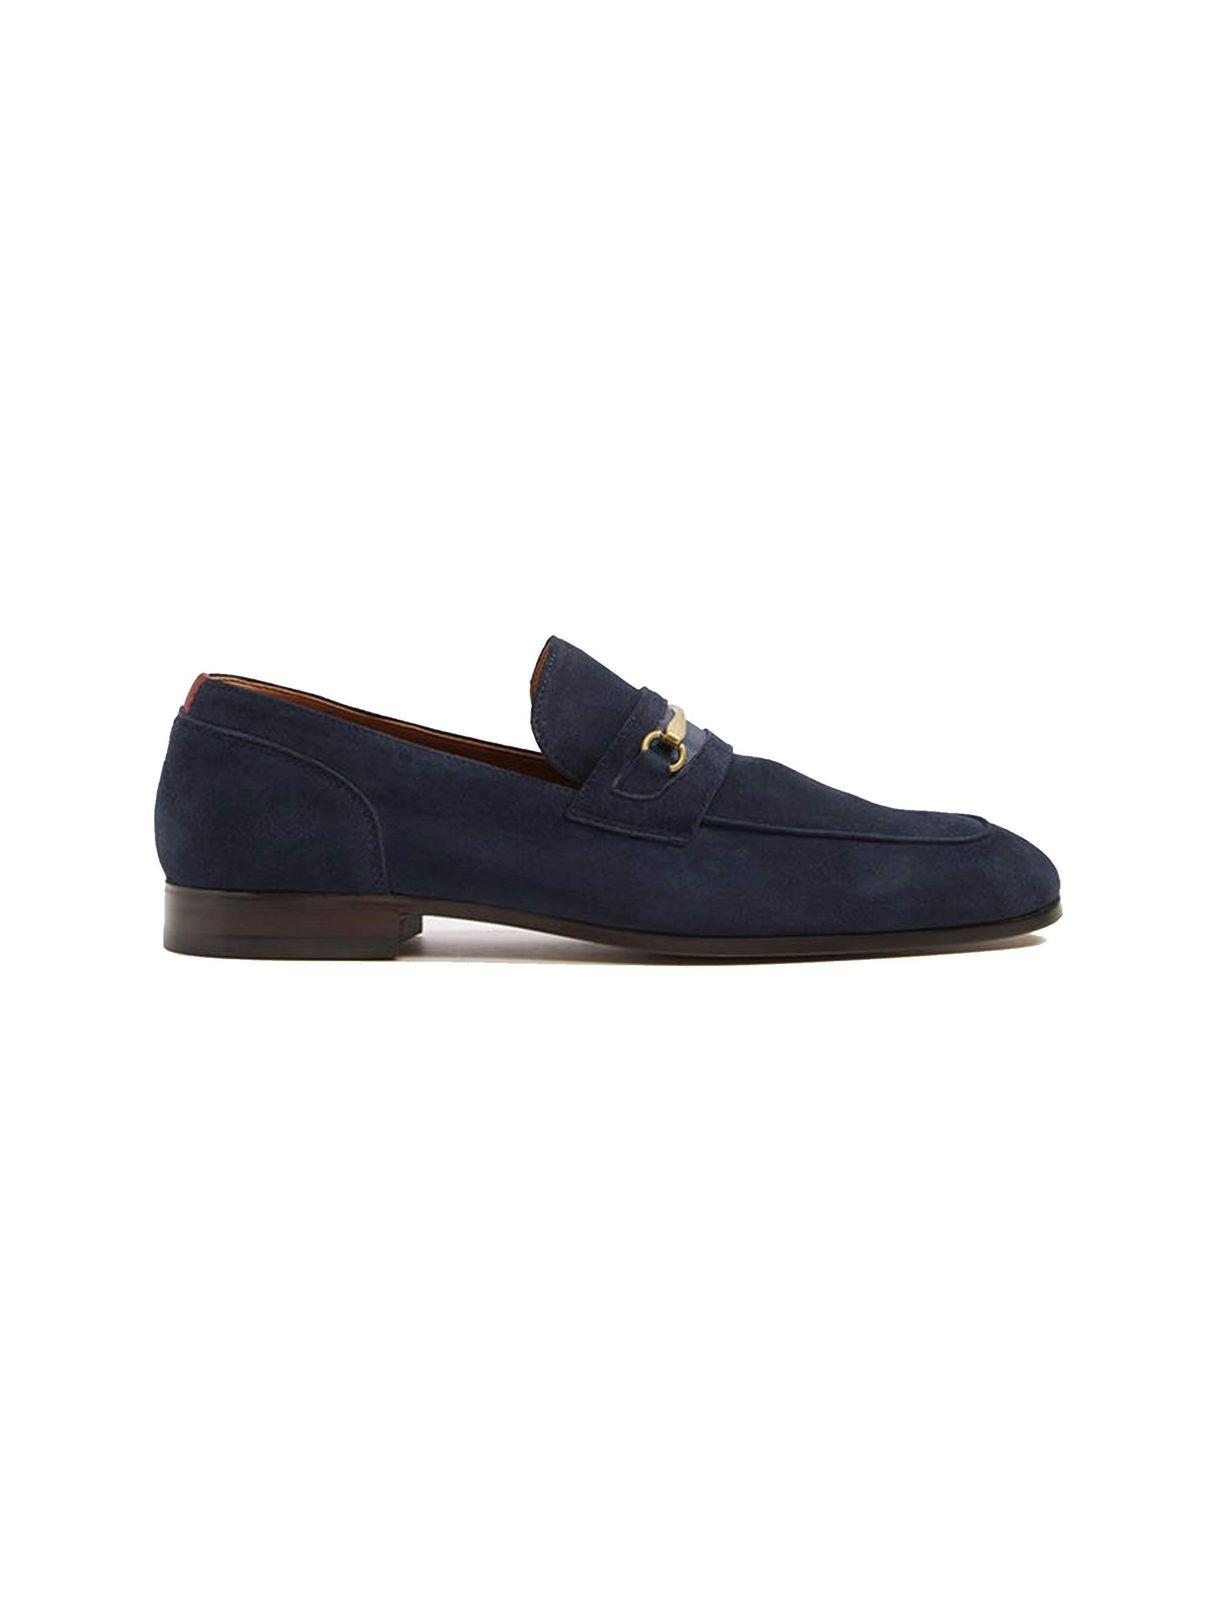 کفش اداری جیر مردانه – آلدو  Men Suede Casual Office Shoes – Aldo